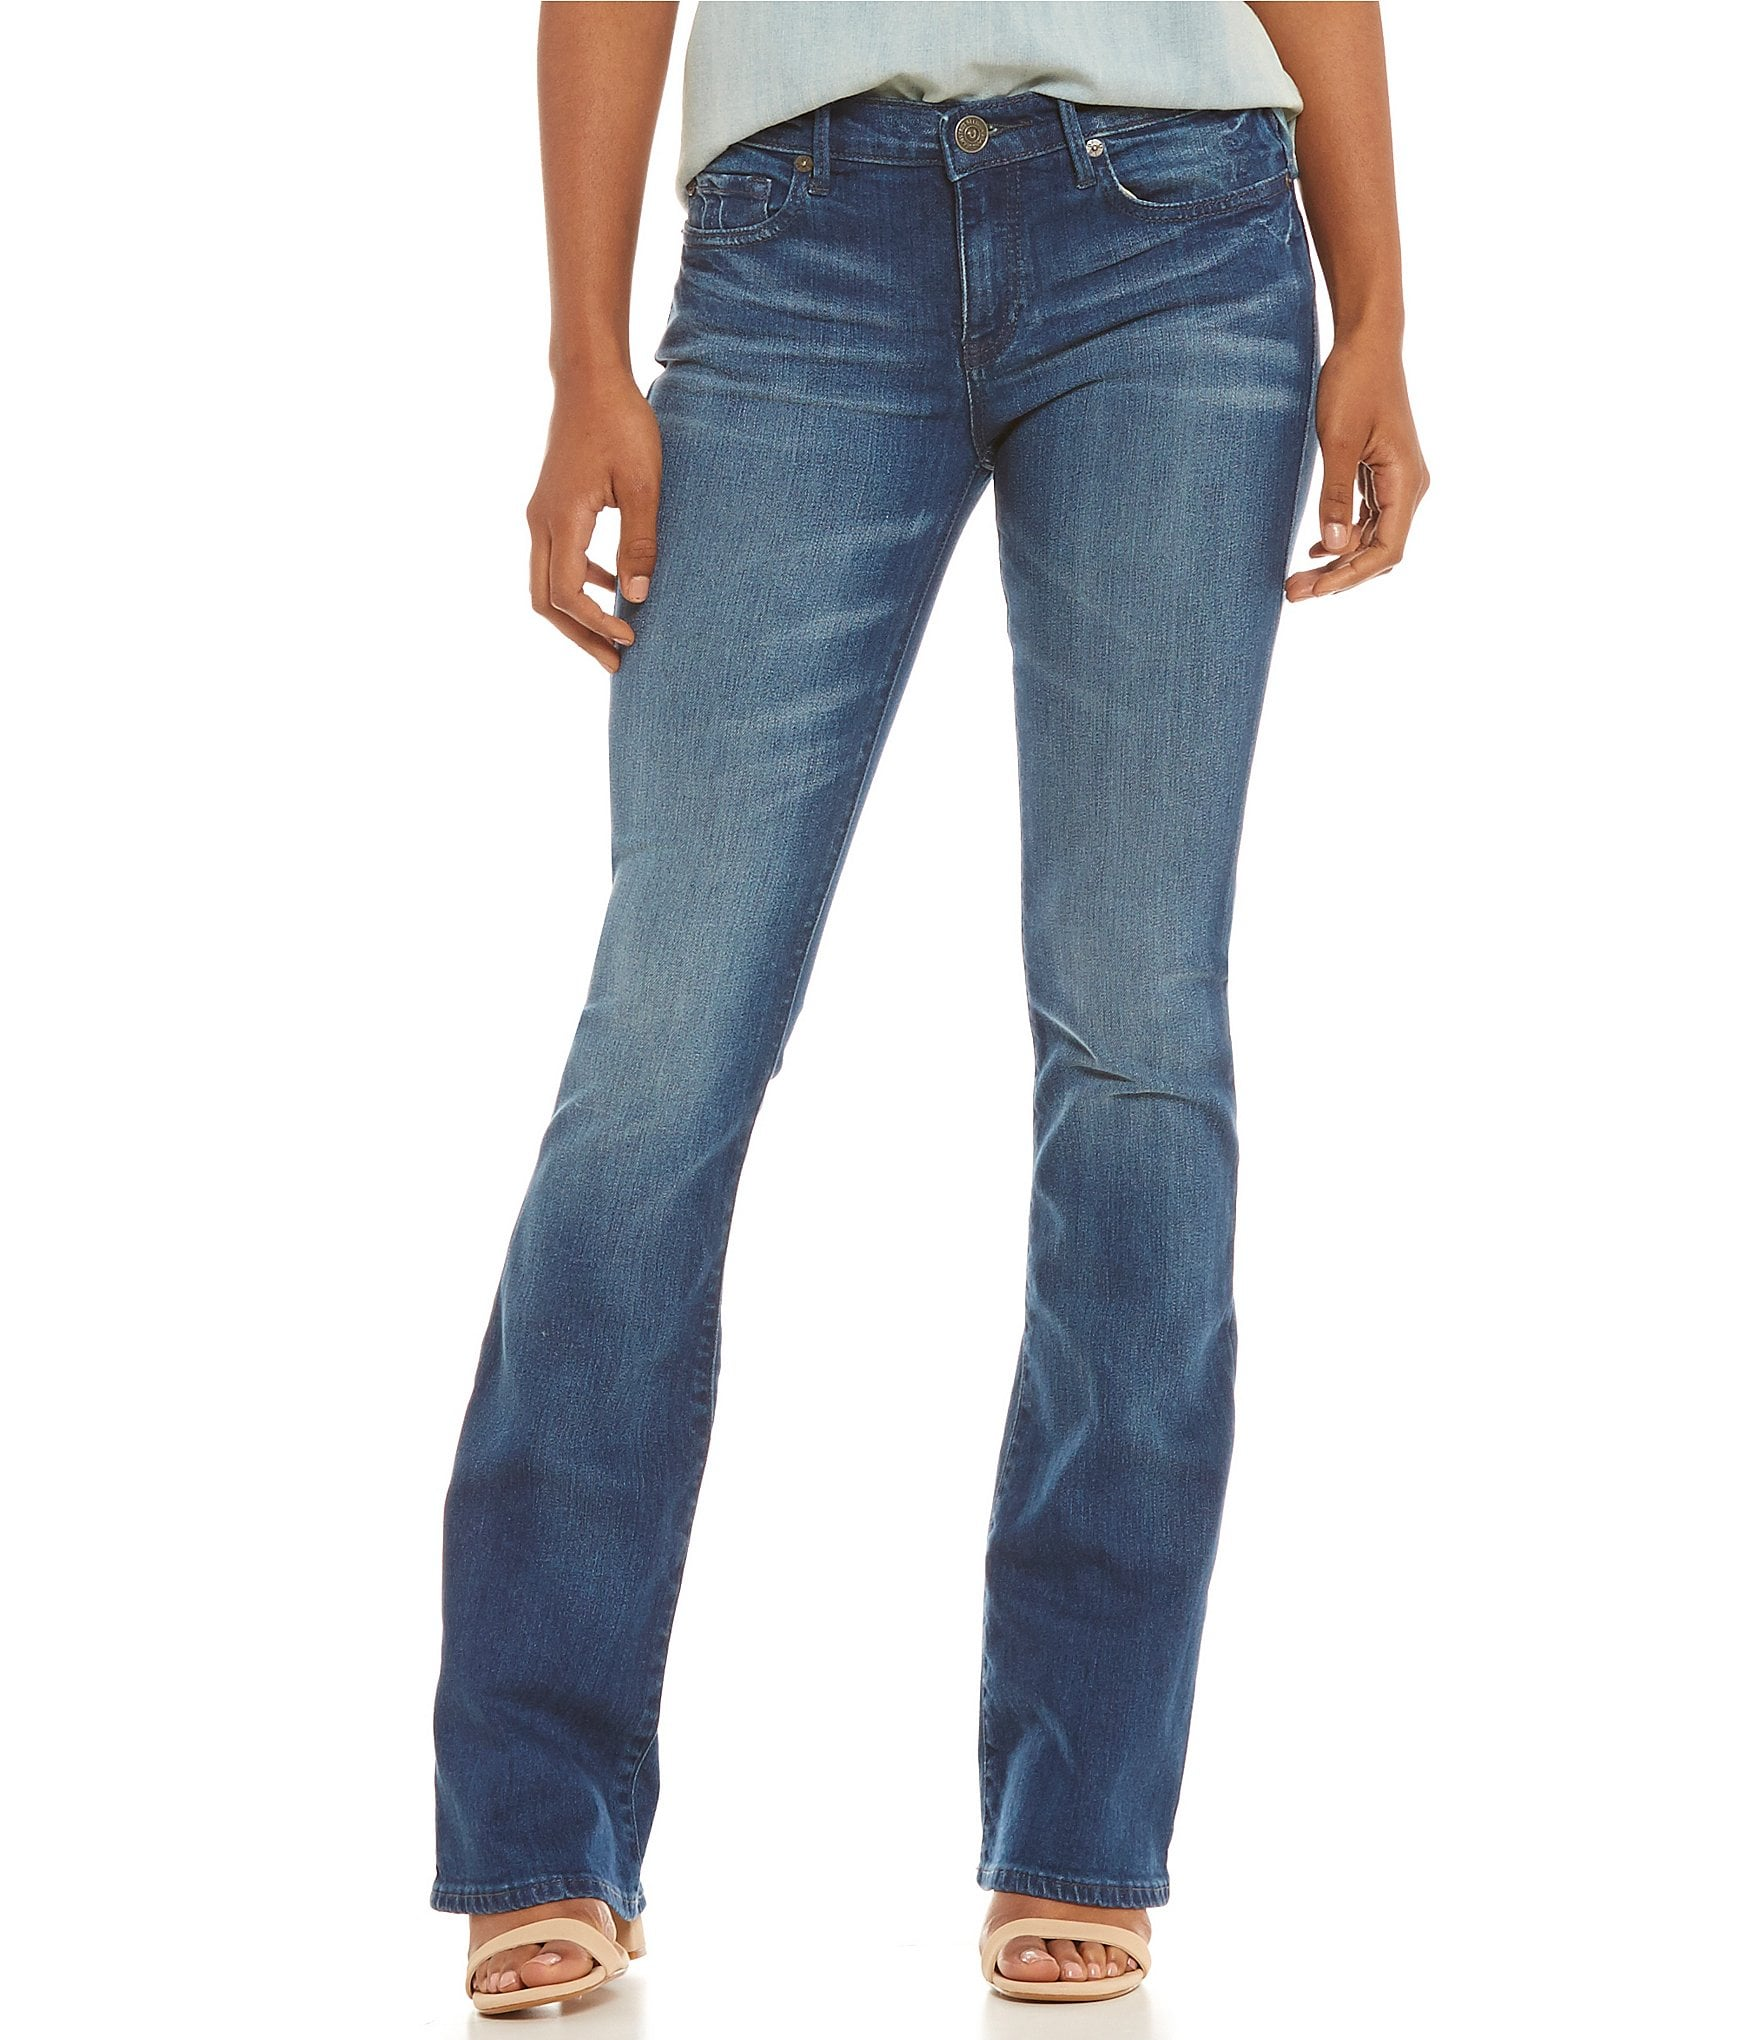 true religion becca mid rise bootcut jeans dillards. Black Bedroom Furniture Sets. Home Design Ideas